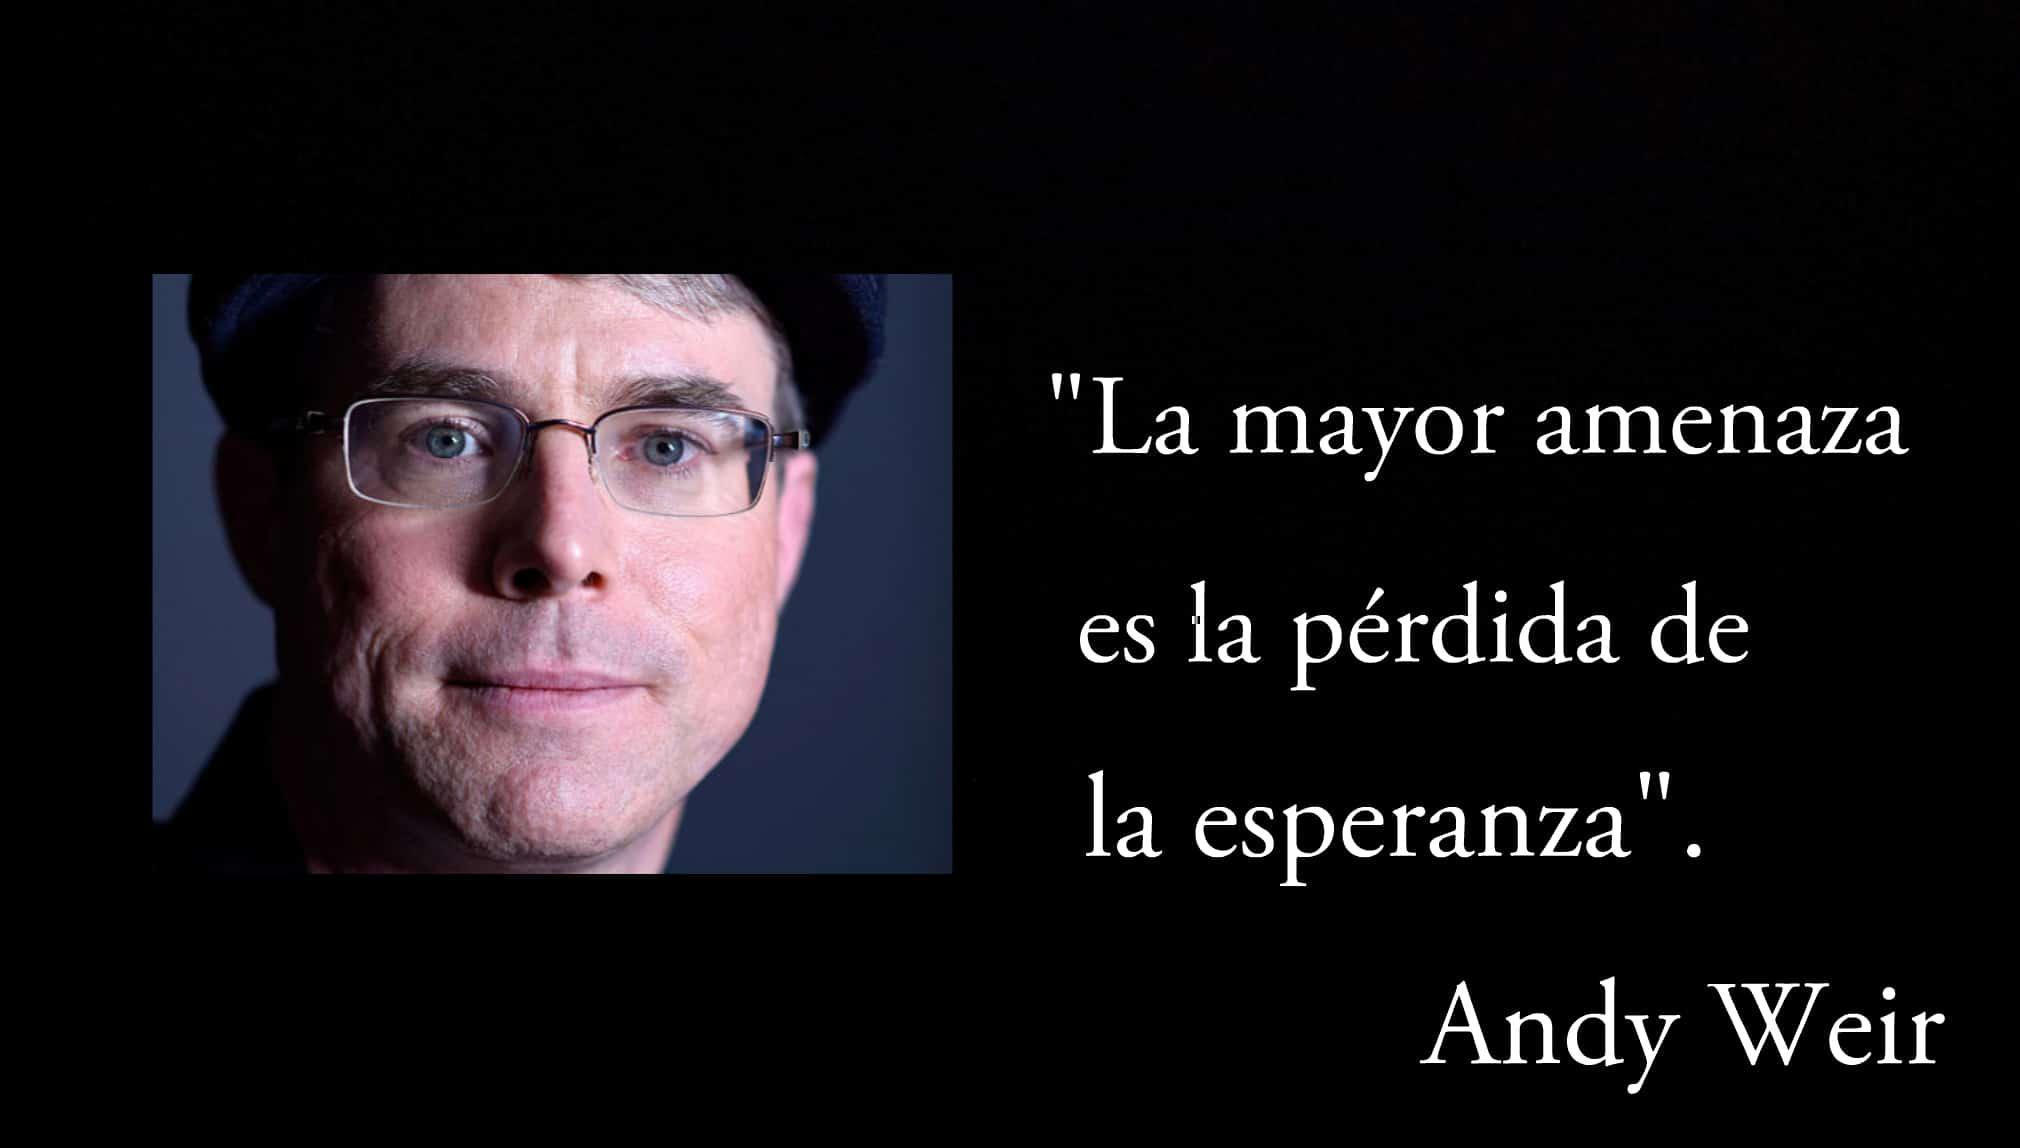 Frase de Andy Weir.